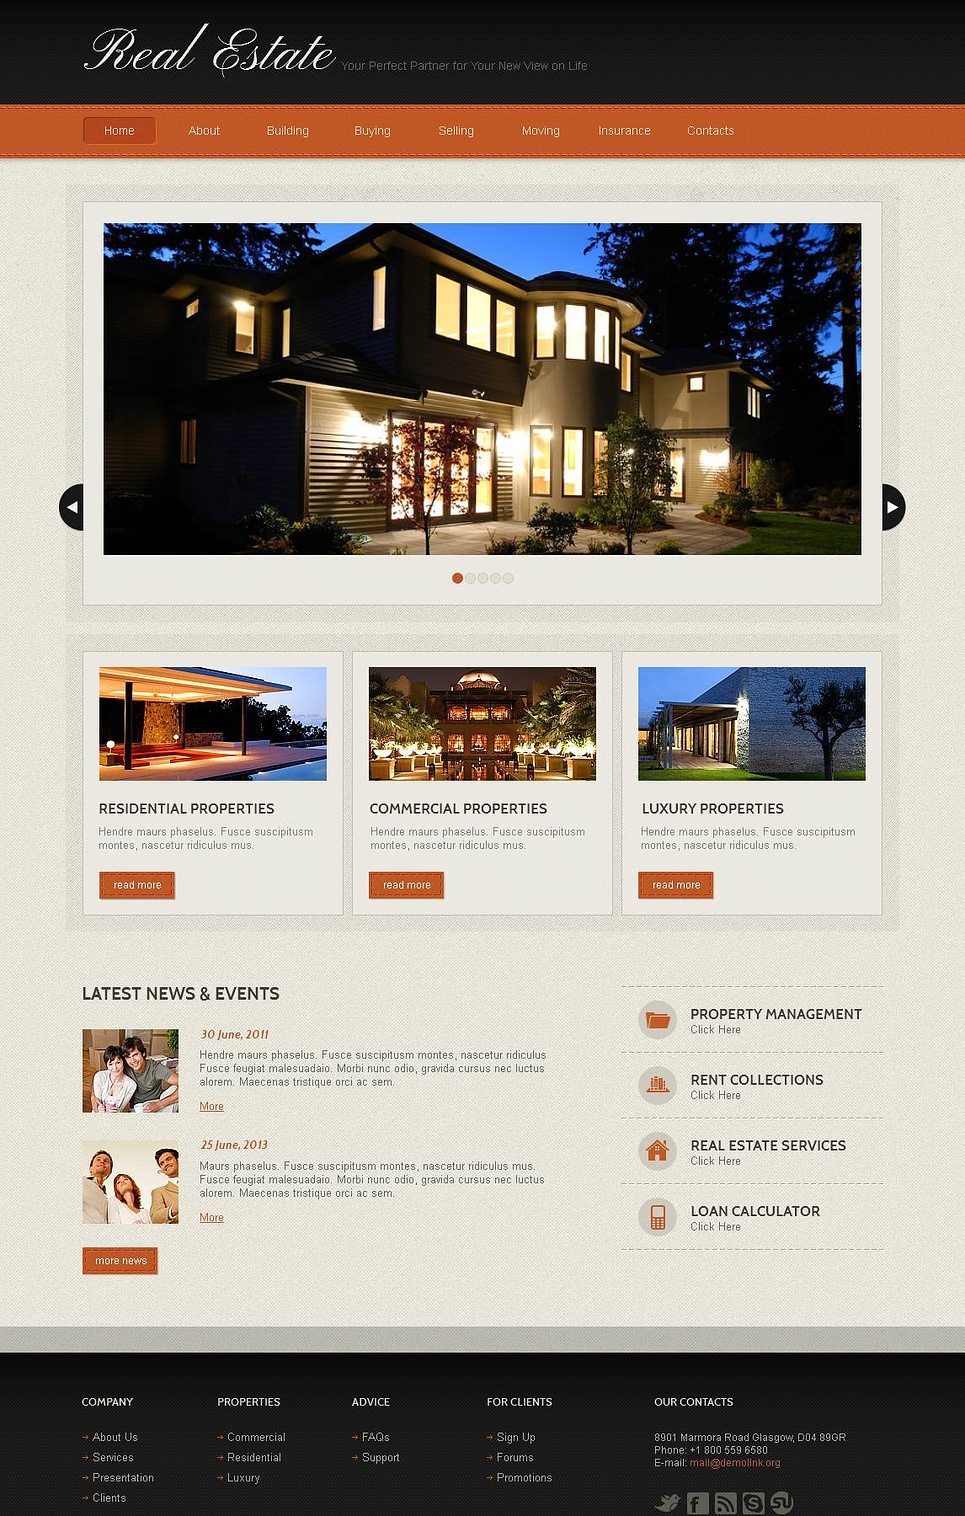 Real Estate Website Template with Elegant Look - image